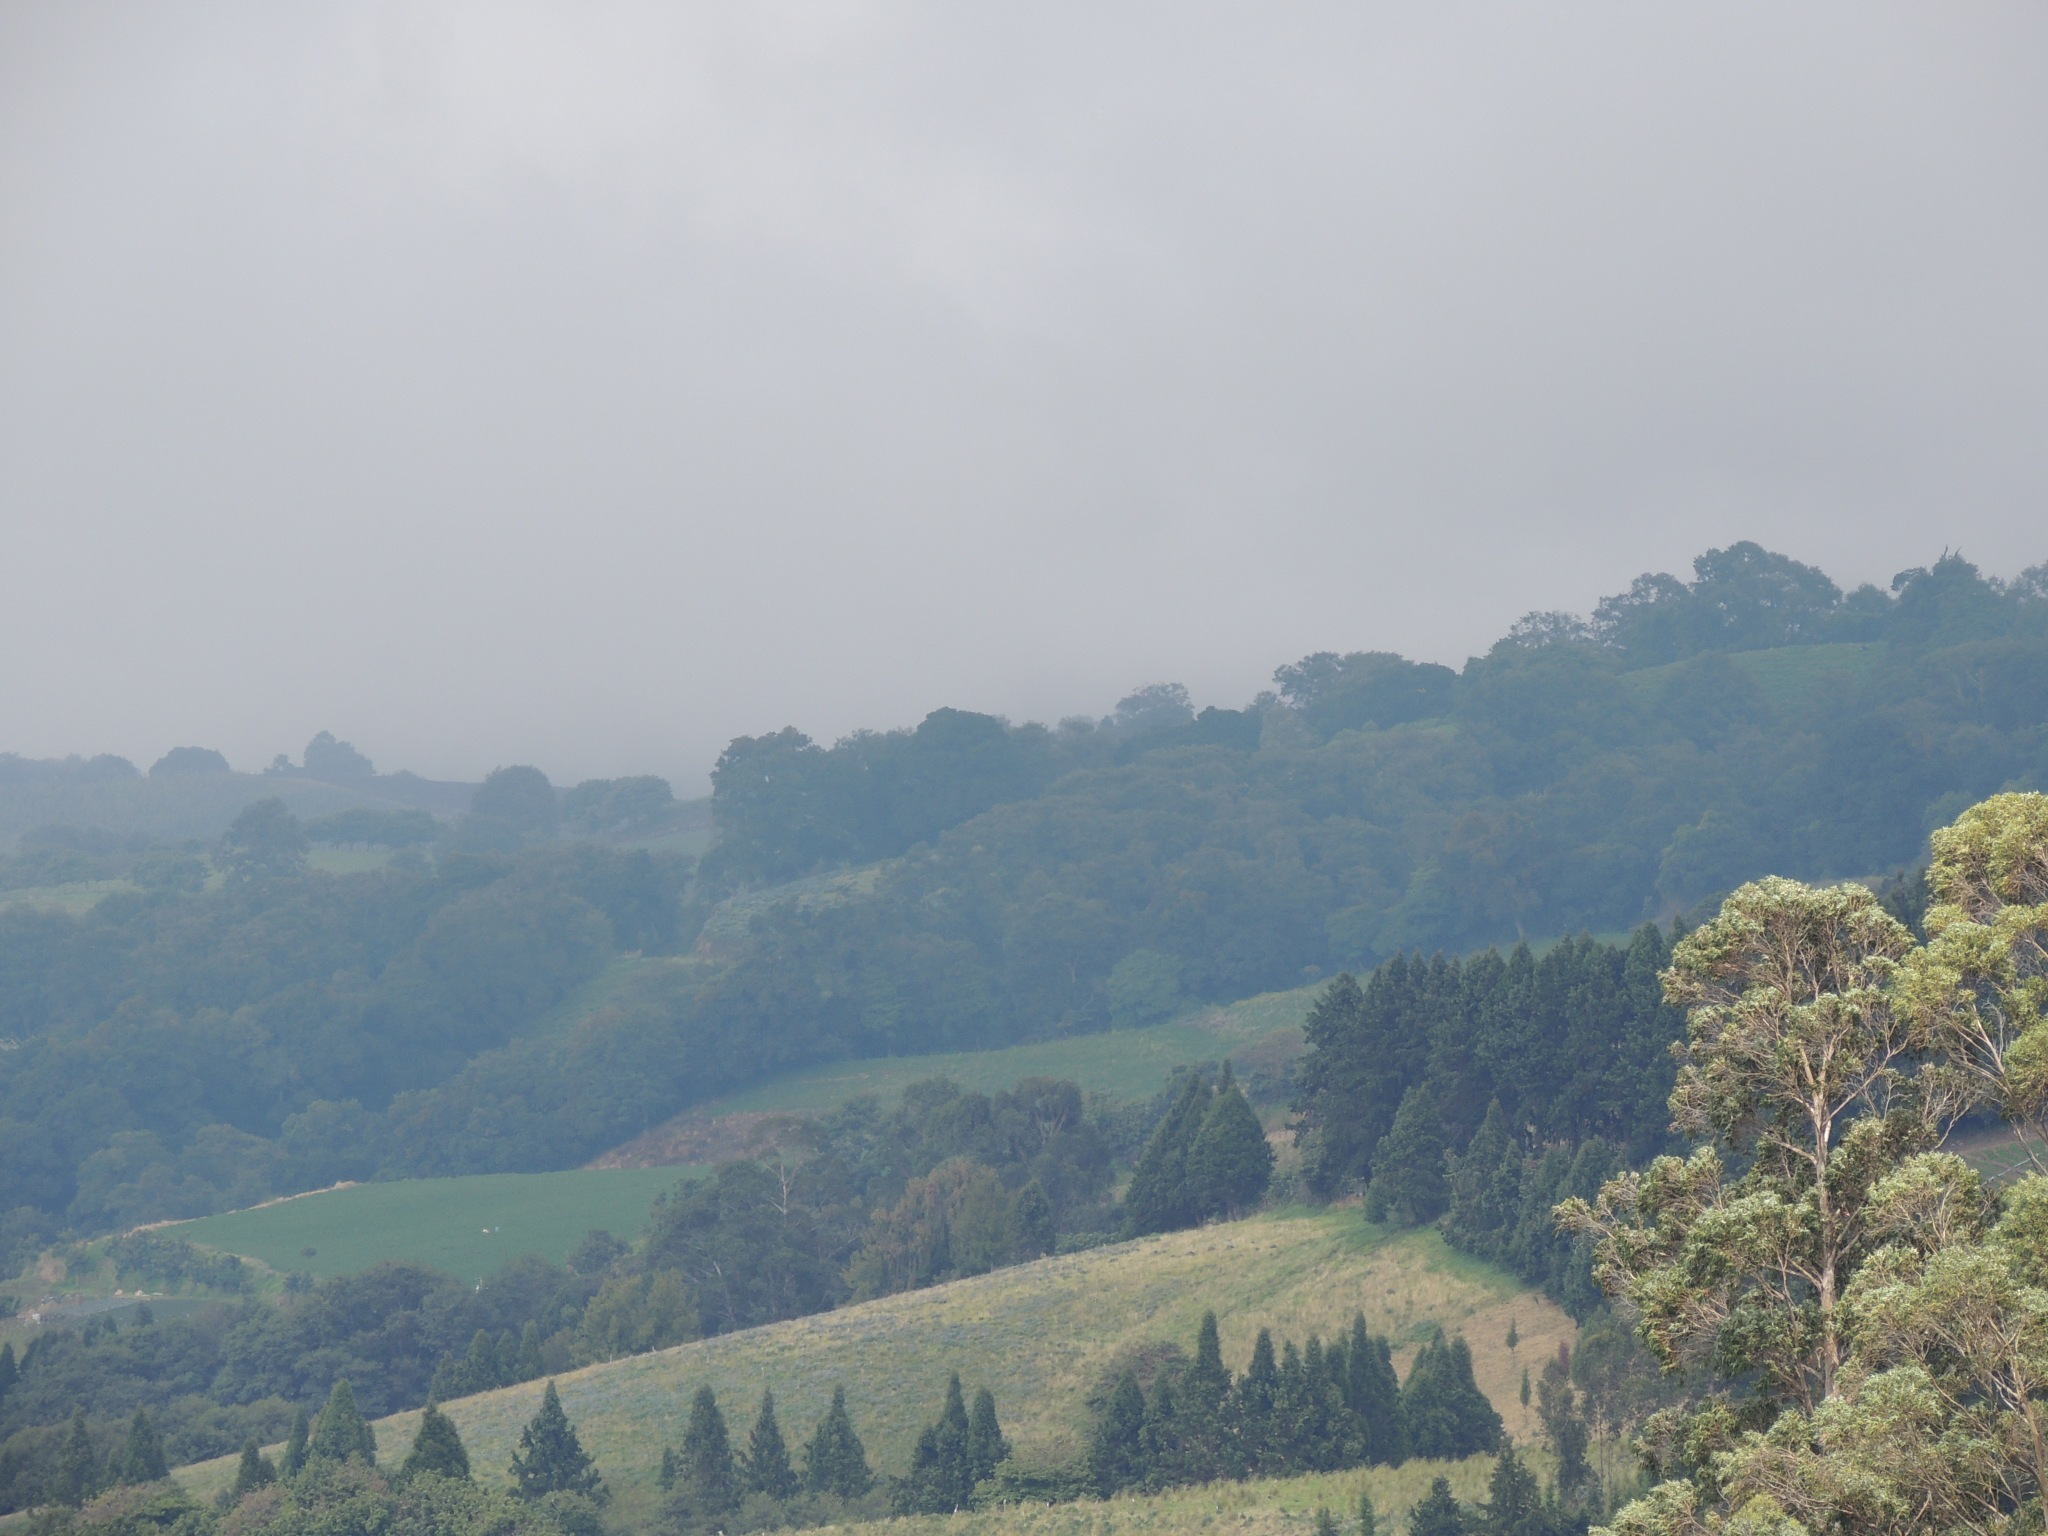 Hazy outlook - Vegetation of Costa Rica by maria.telegdy